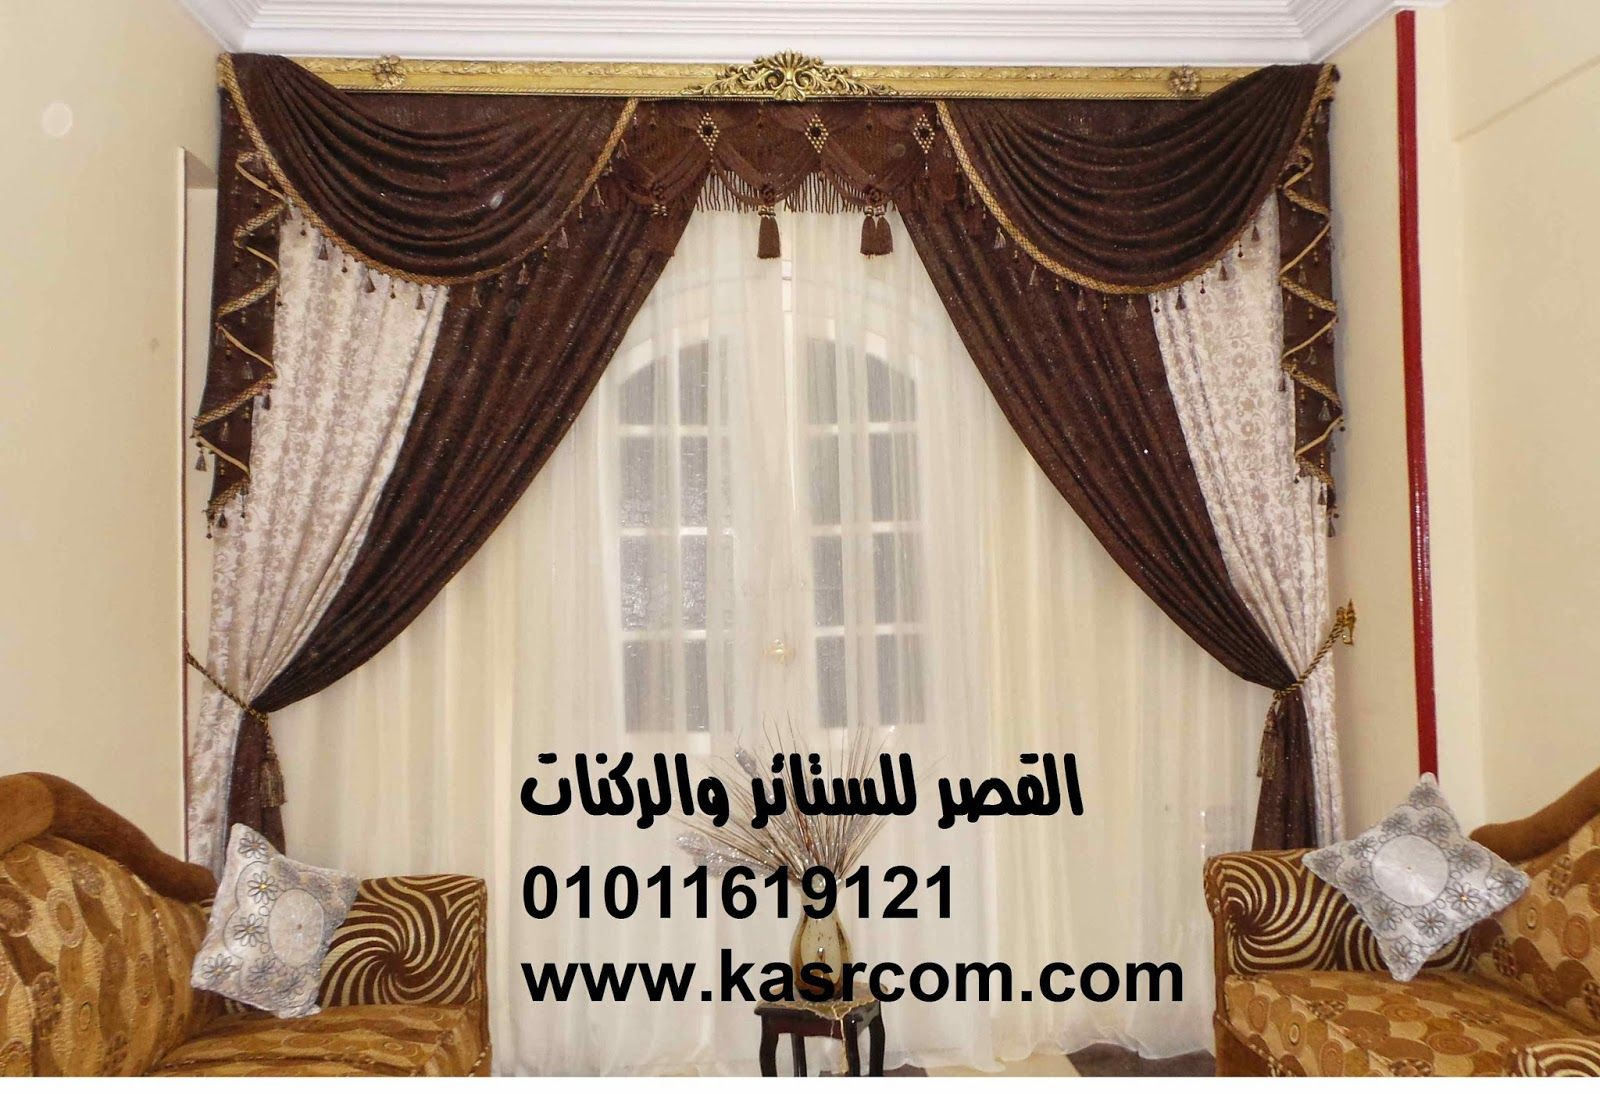 القصر للستائر والركنات Valance Curtains Home Decor Decor